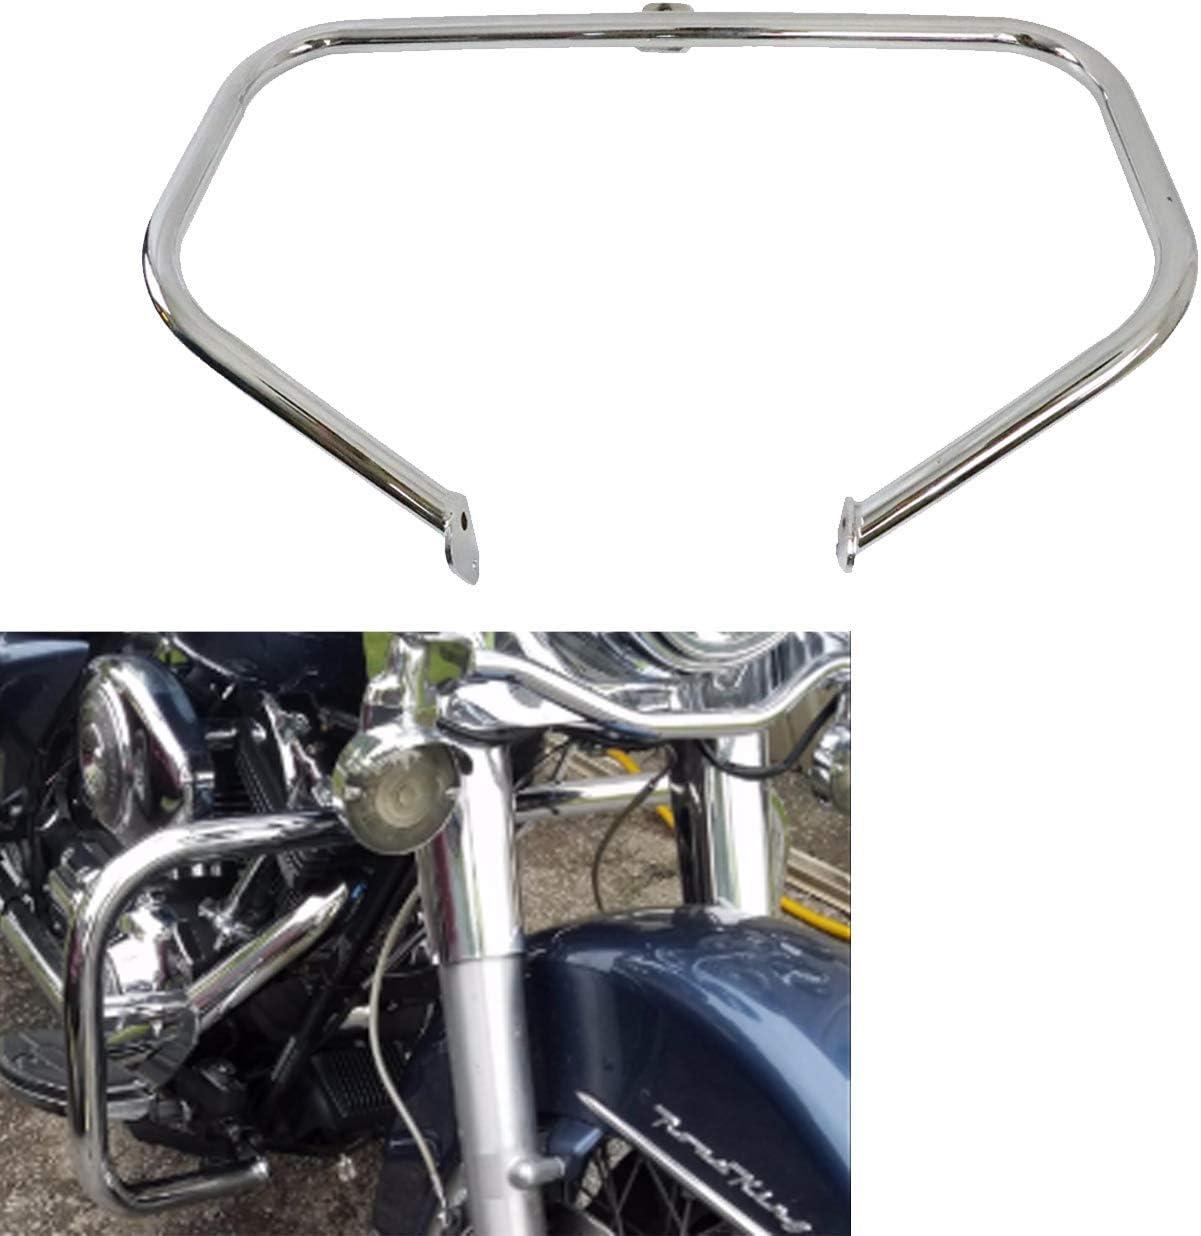 AUFER 1 1//4 Chrome Engine Guard Highway Crash Bar Fits For Touring Electra Glide FLHT HD Road King 1997-2008